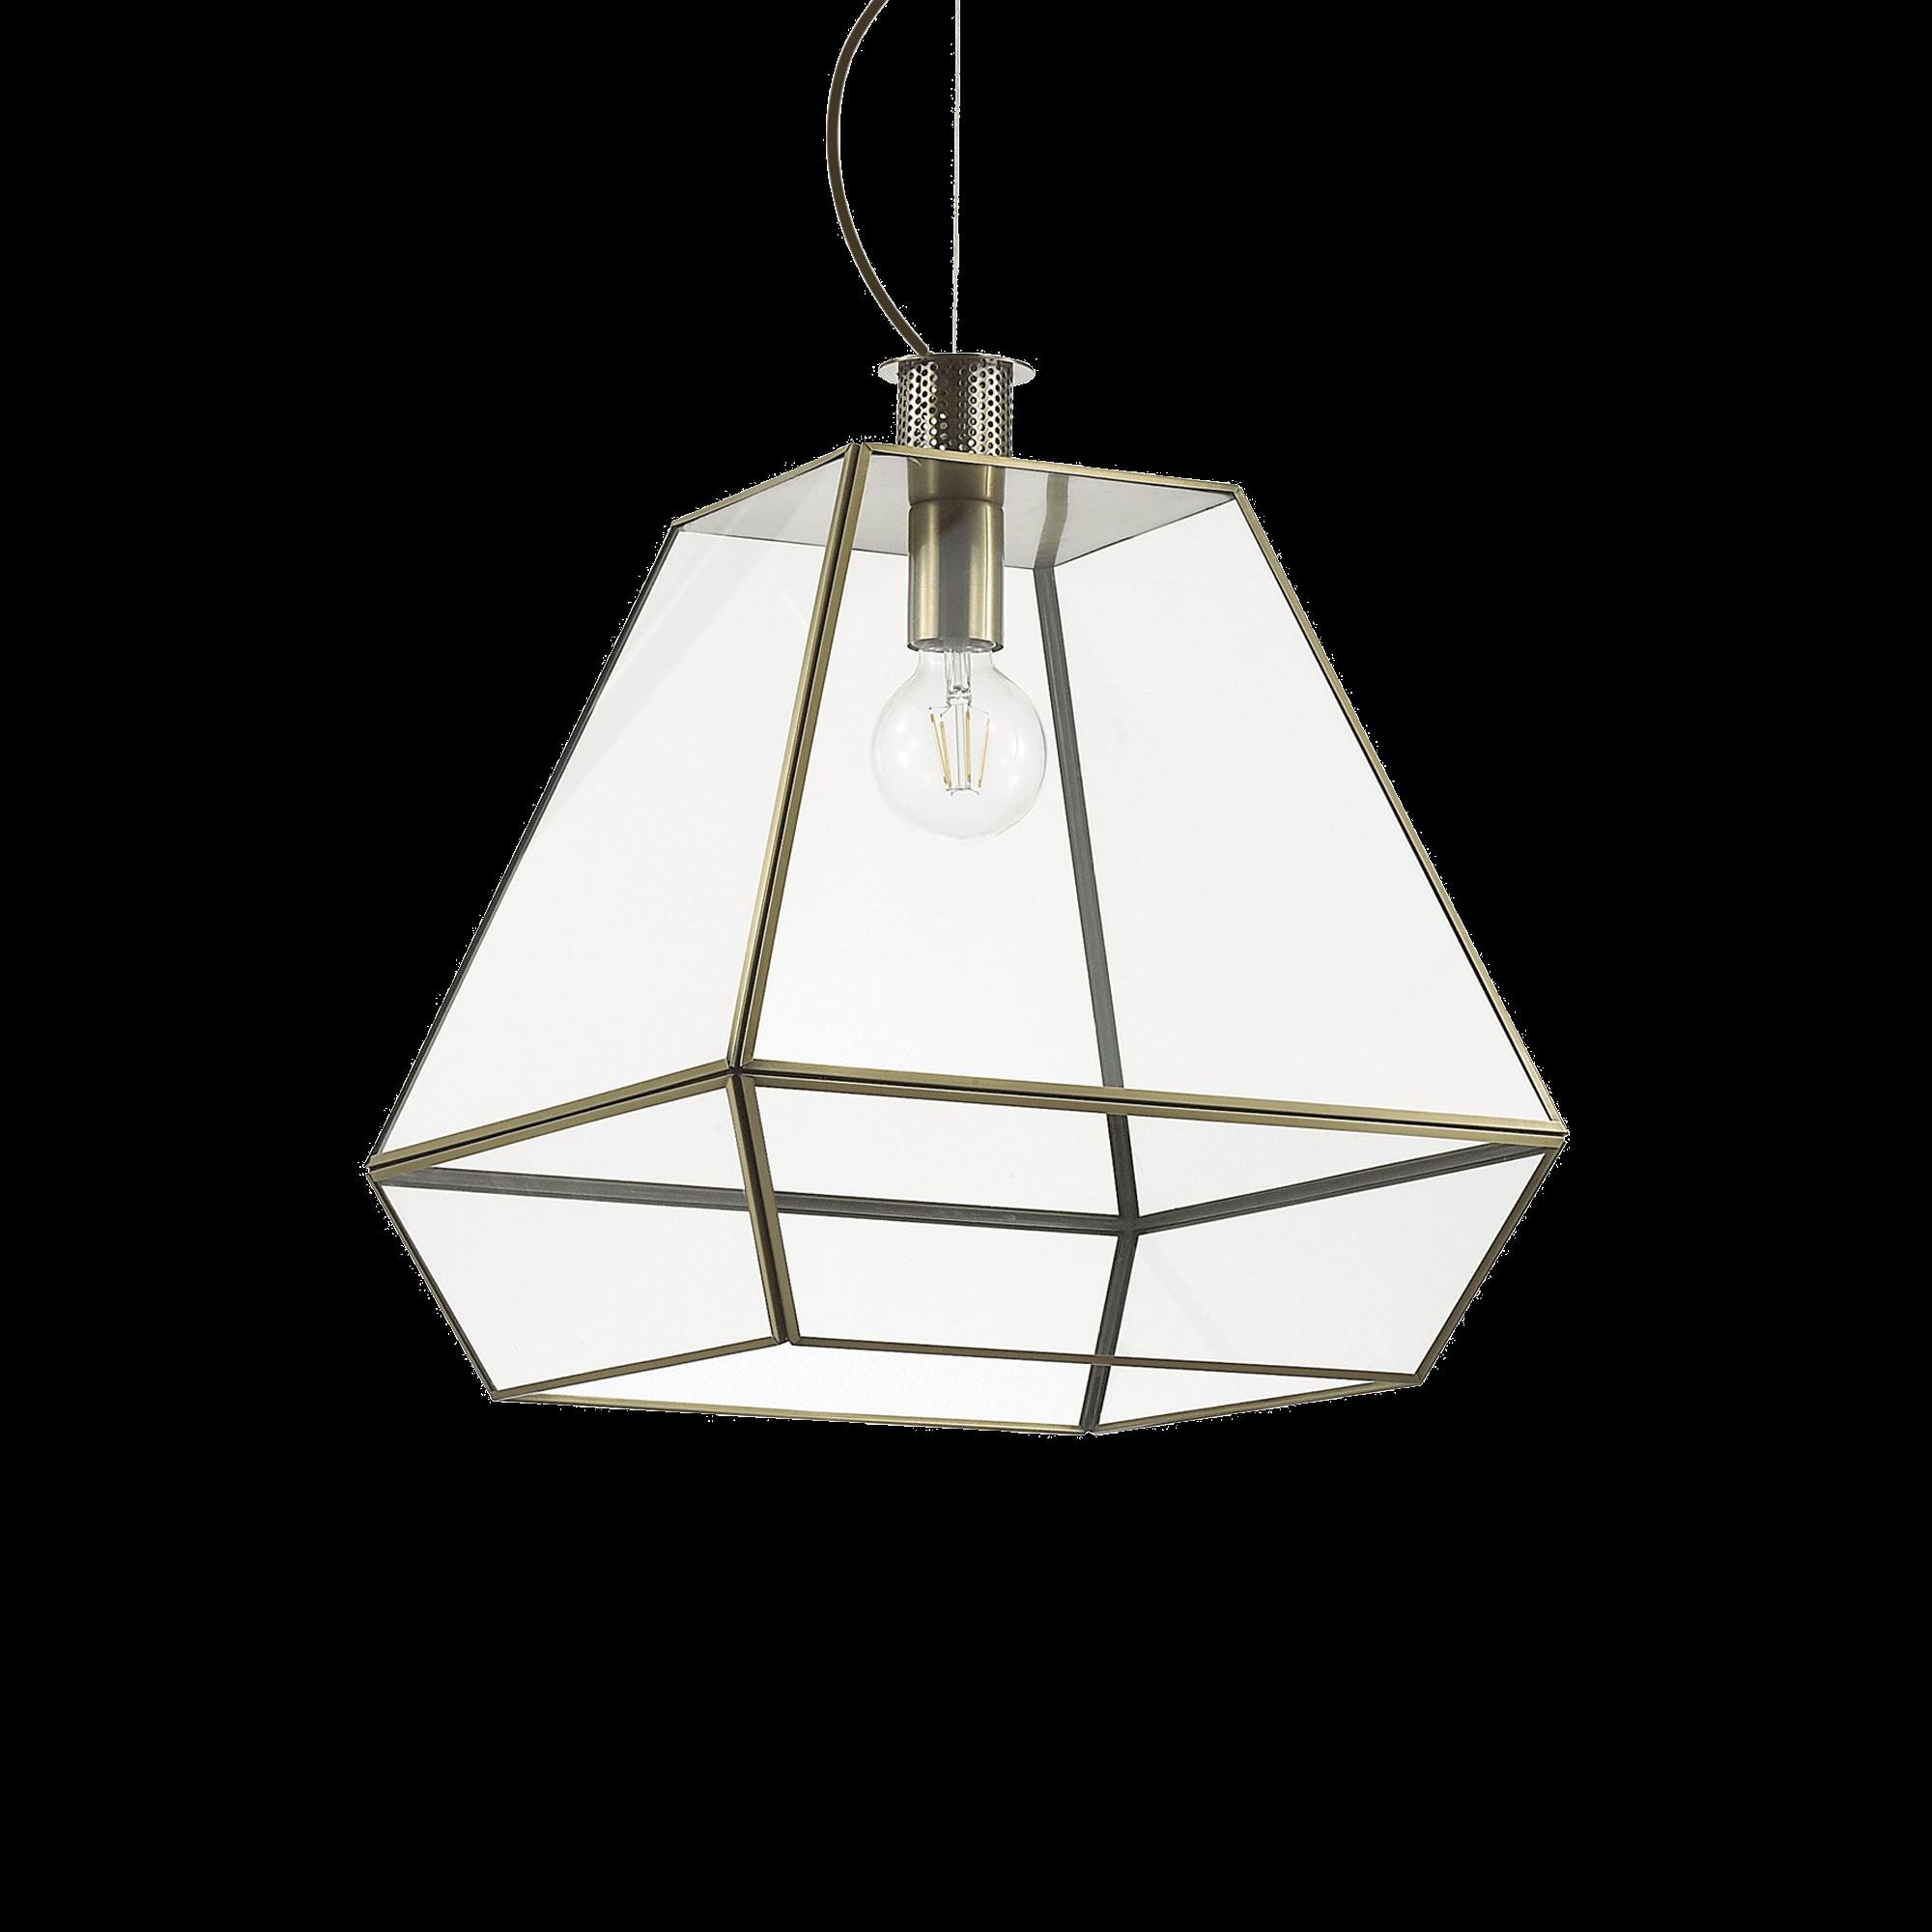 Ideal Lux 160085 ORANGERIE SP1 BIG függeszték